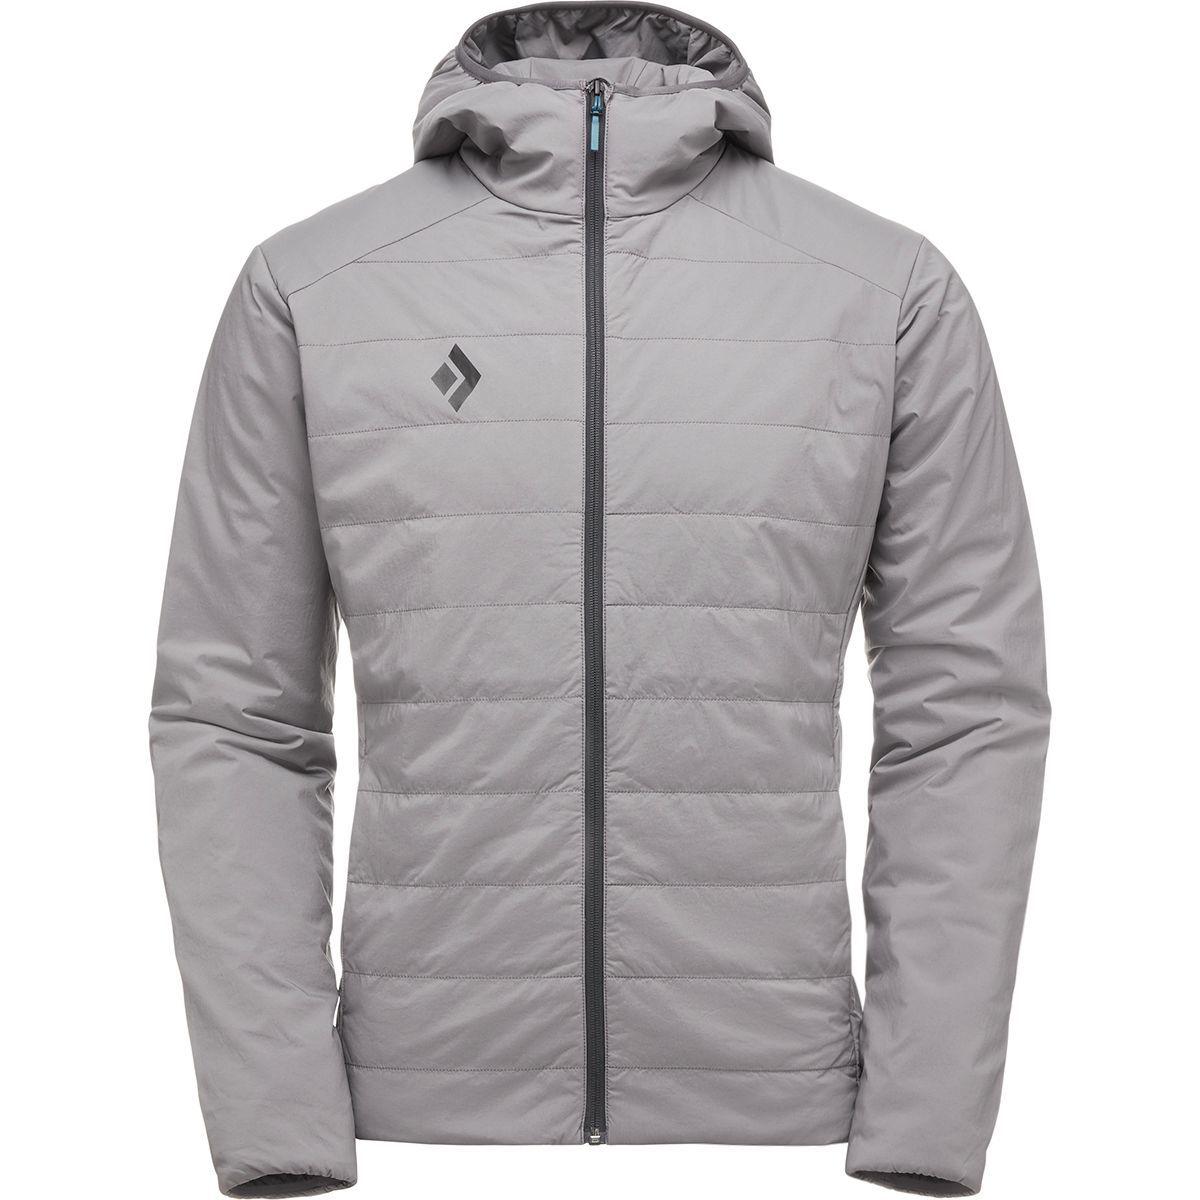 Black Diamond First Light Insulated Hooded Jacket - Men's